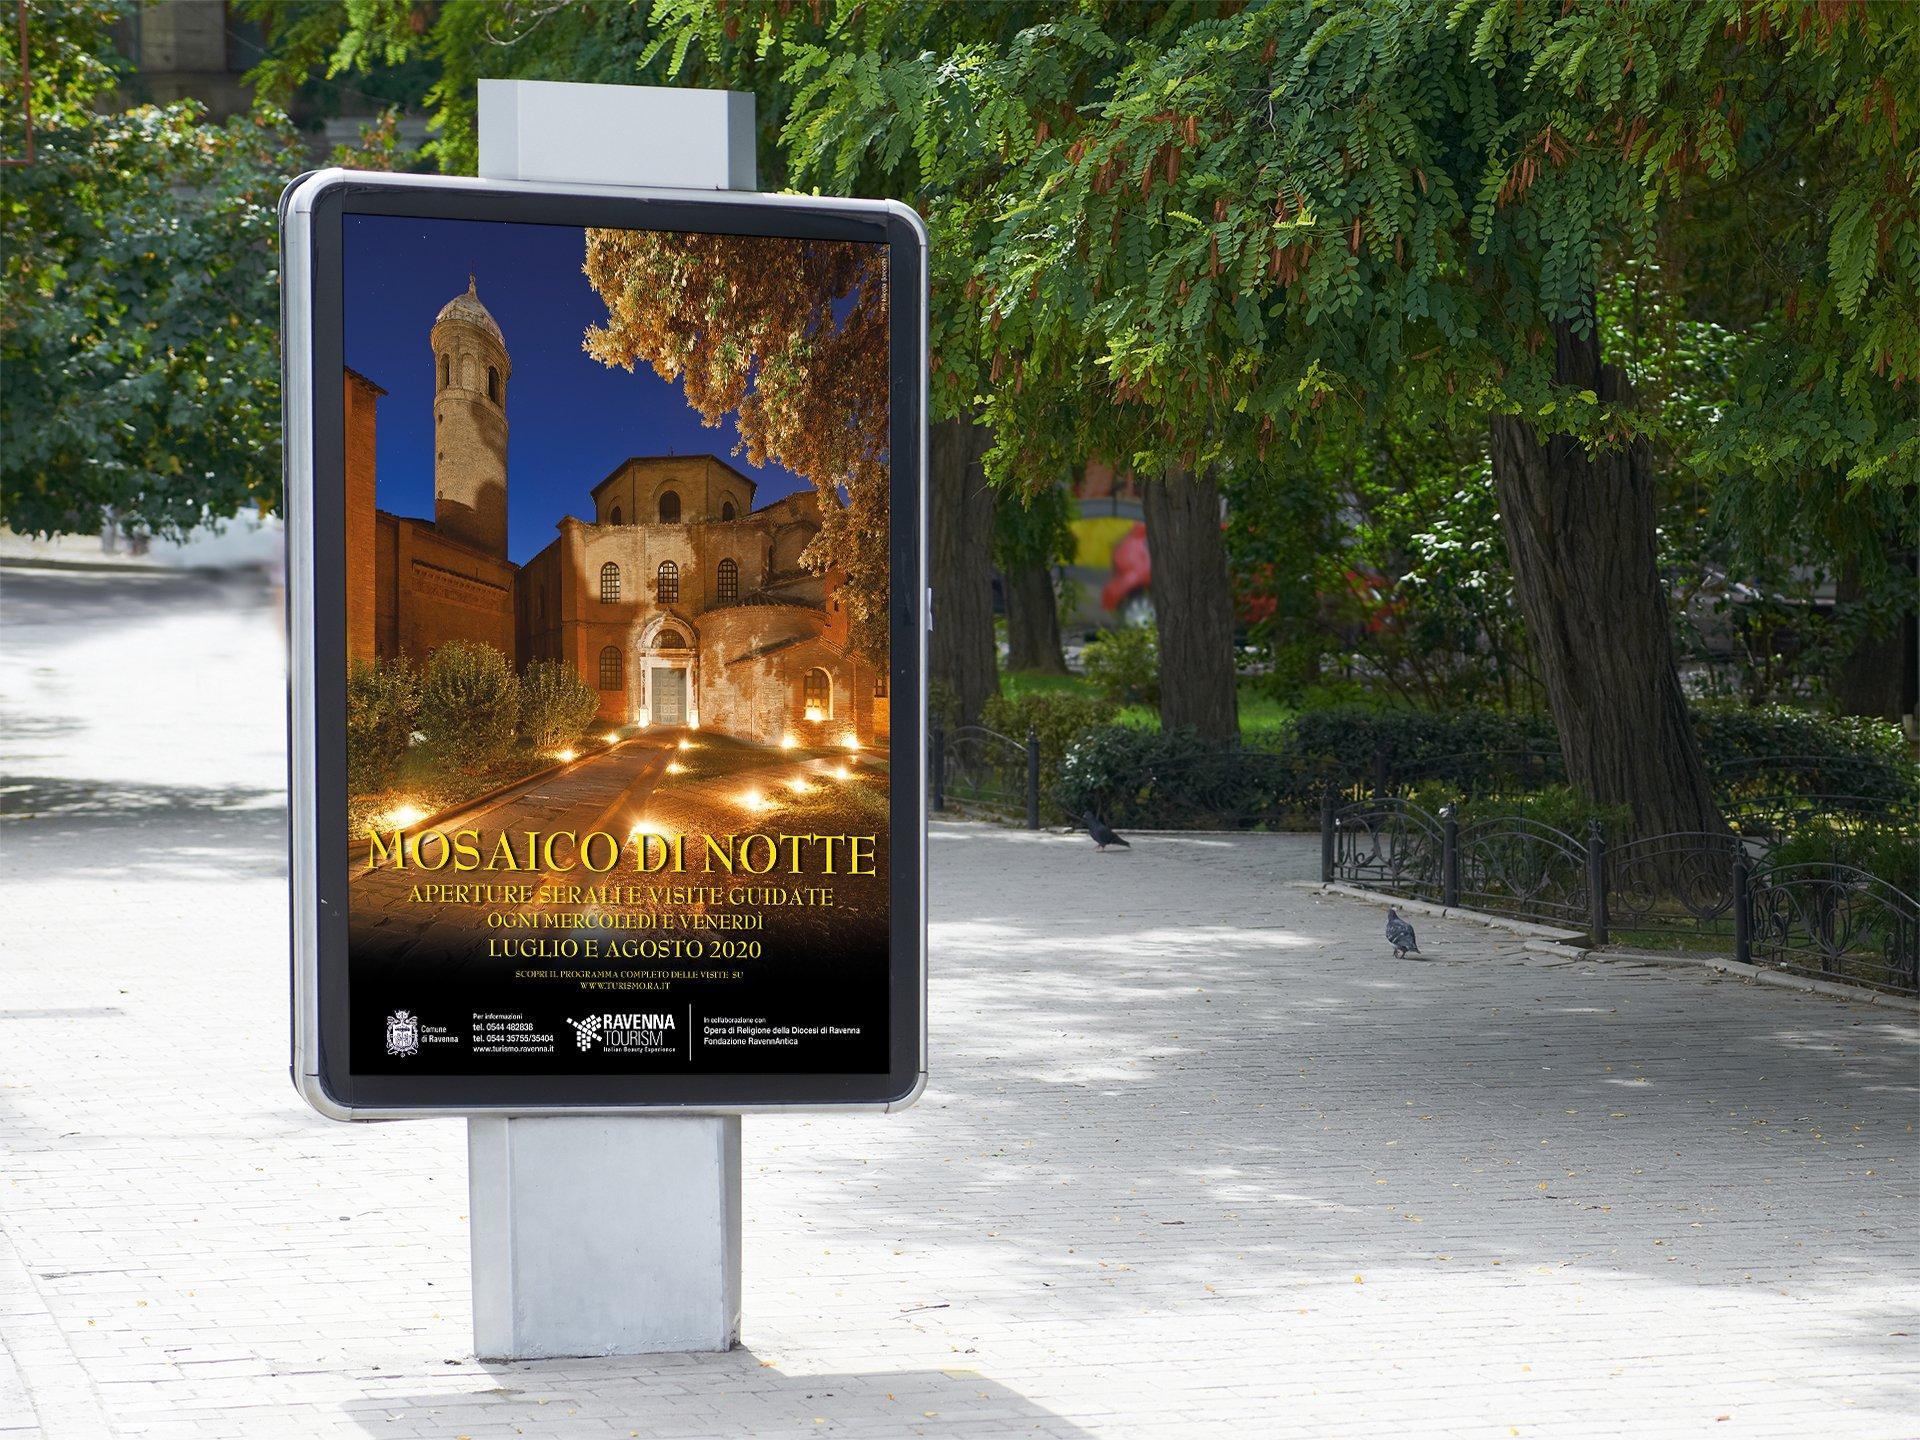 Mosaico di Notte - Ravenna Tourism